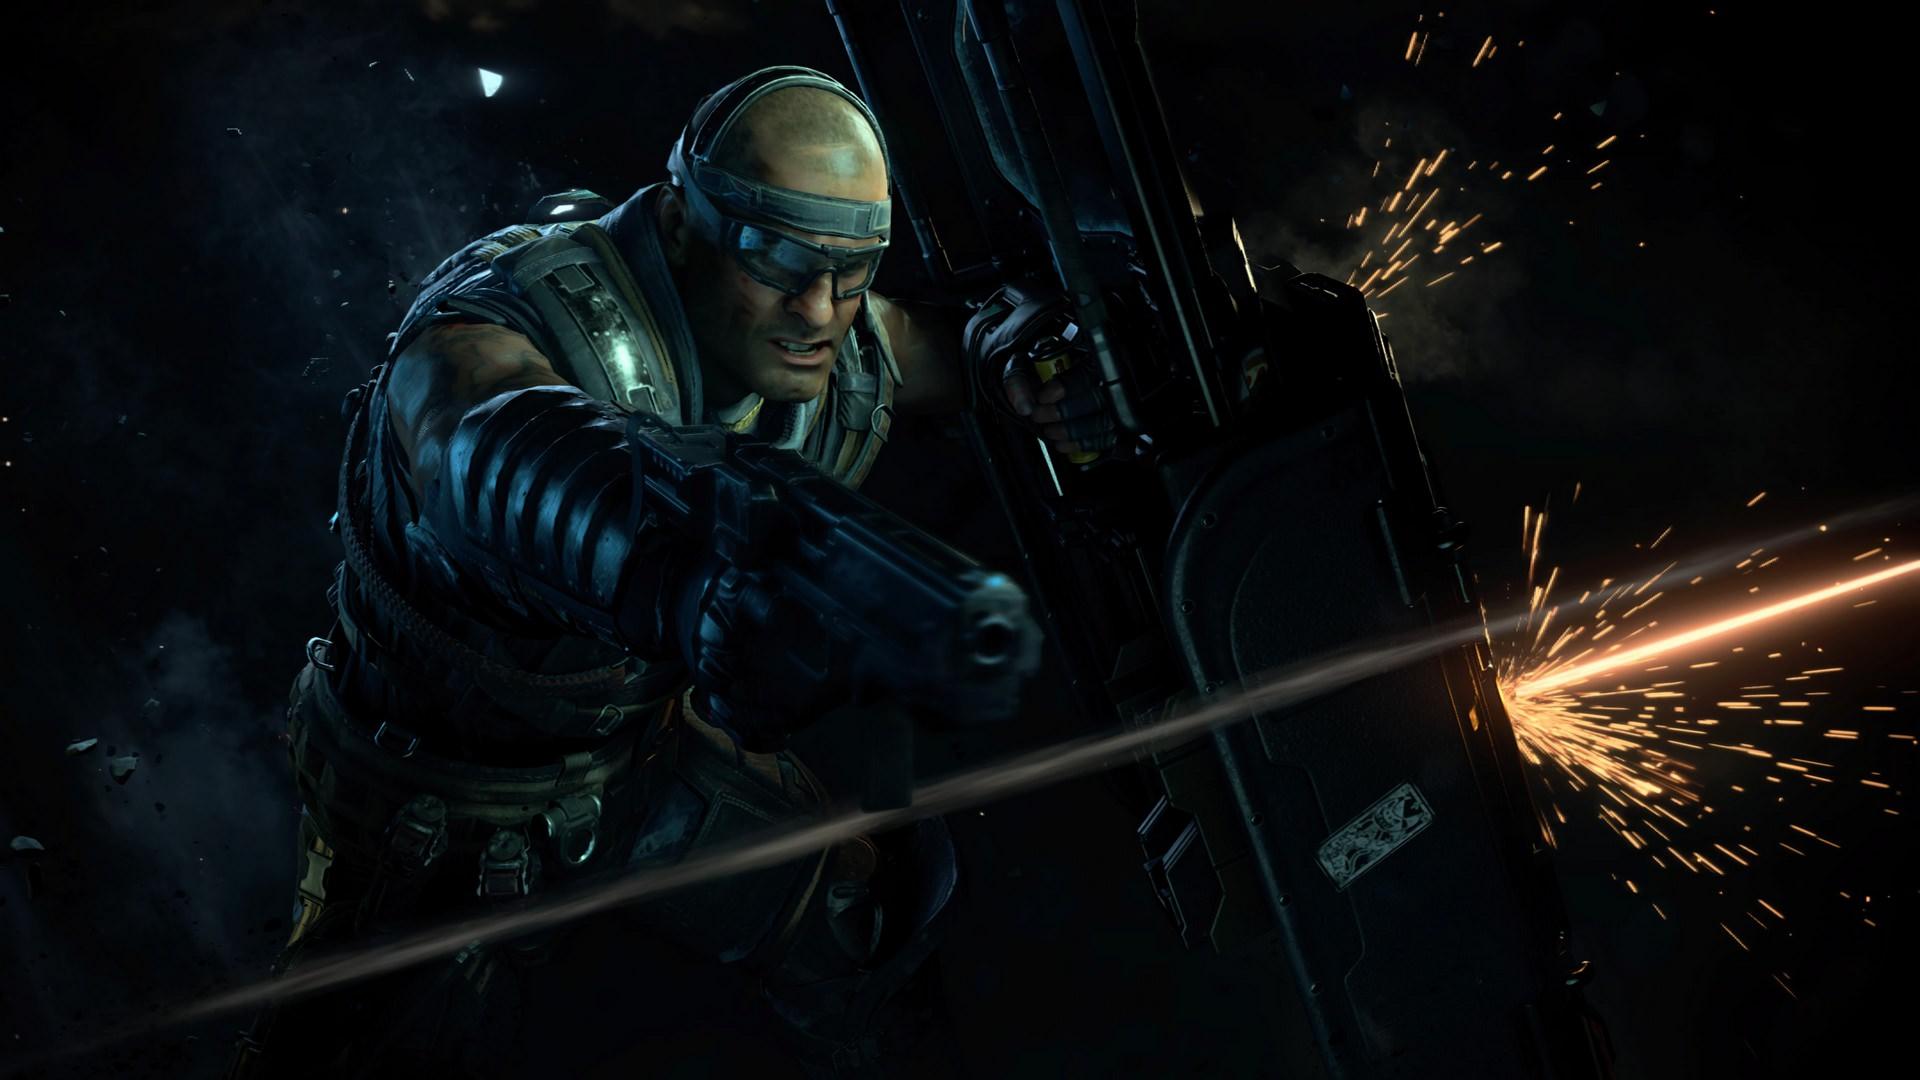 AJax Call of Duty Black Ops 4 Treyarch